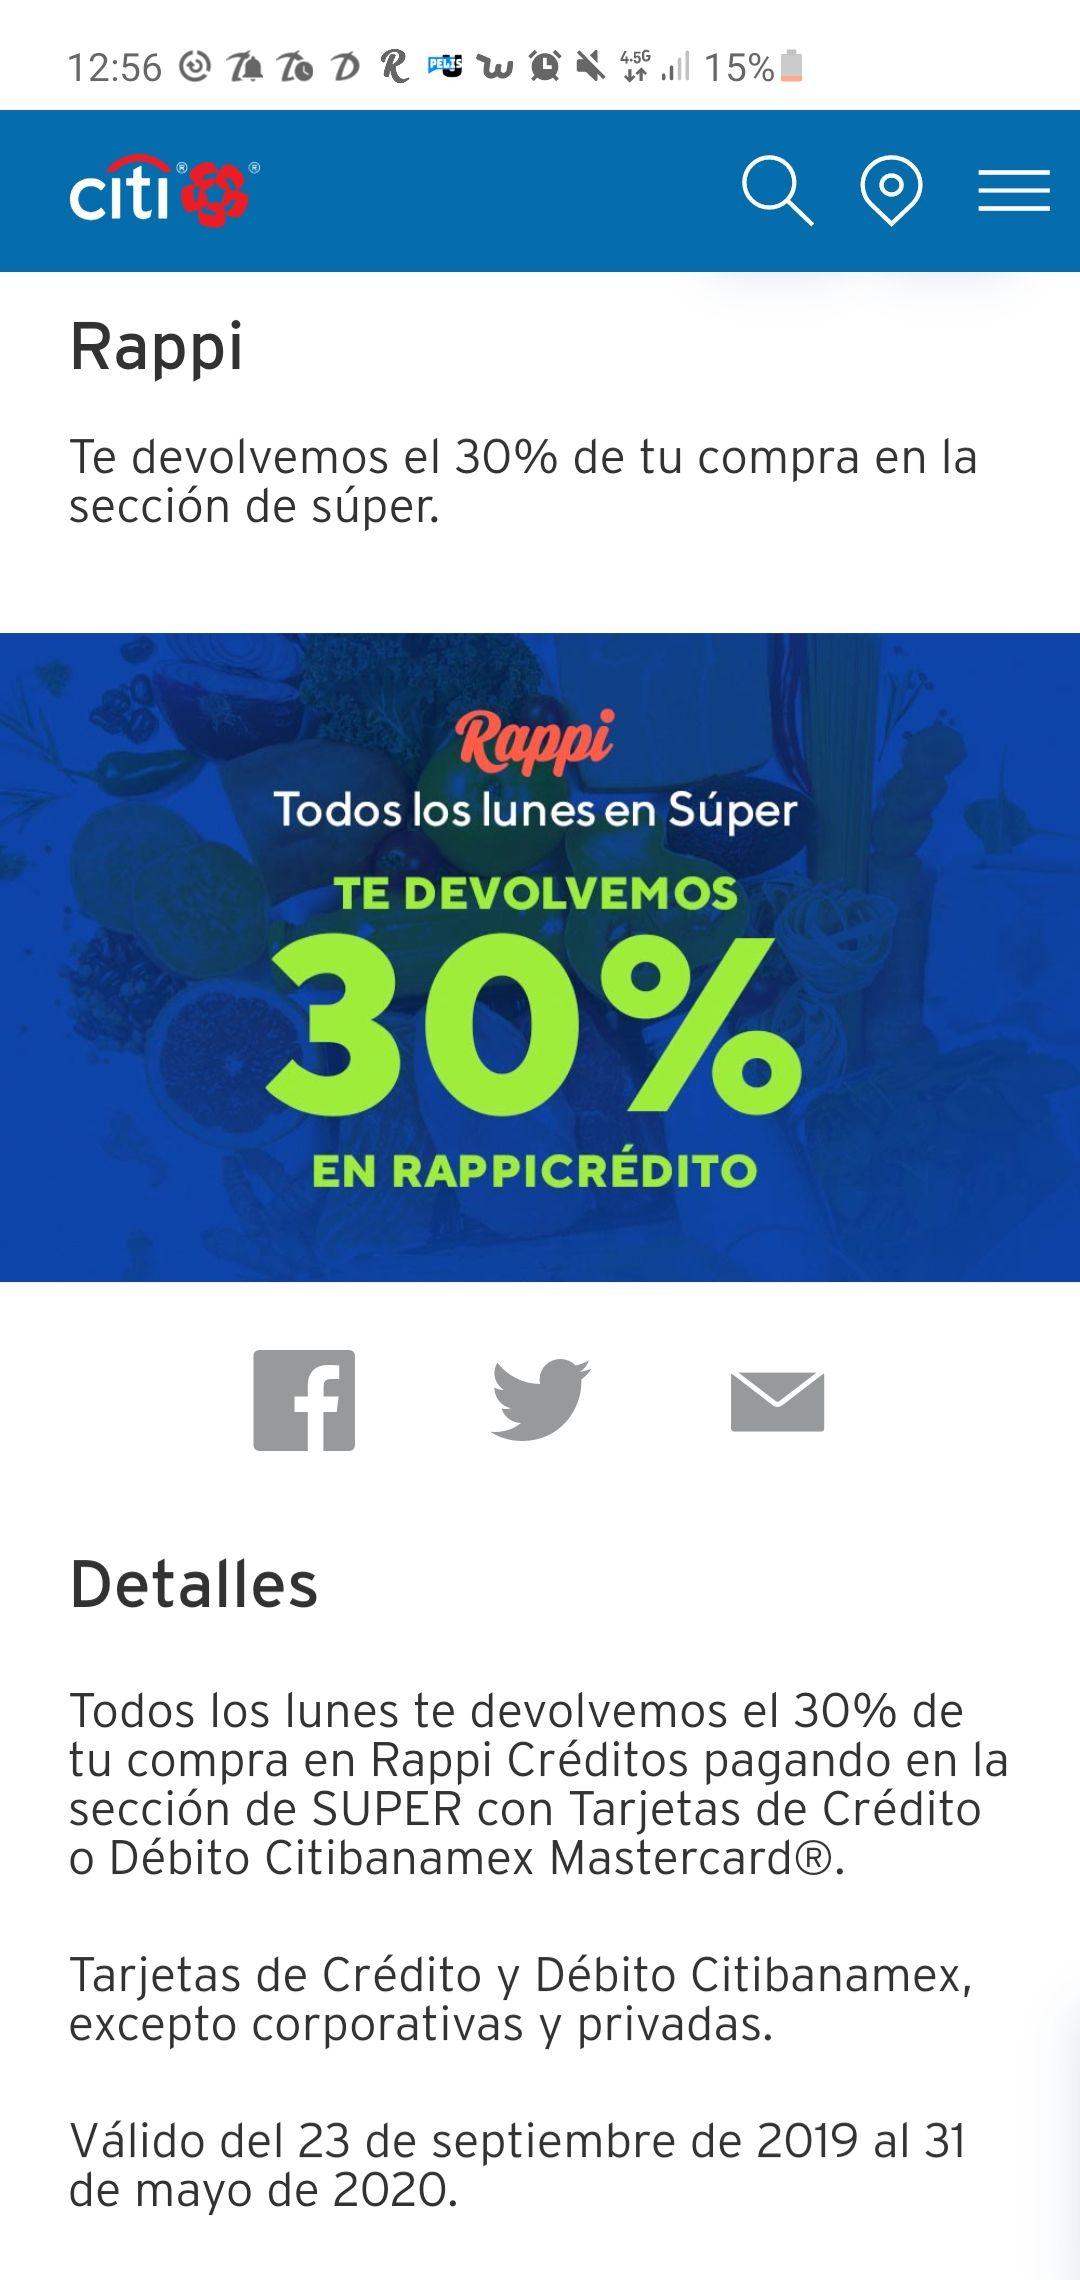 Rappi: 30% en Rappicréditos